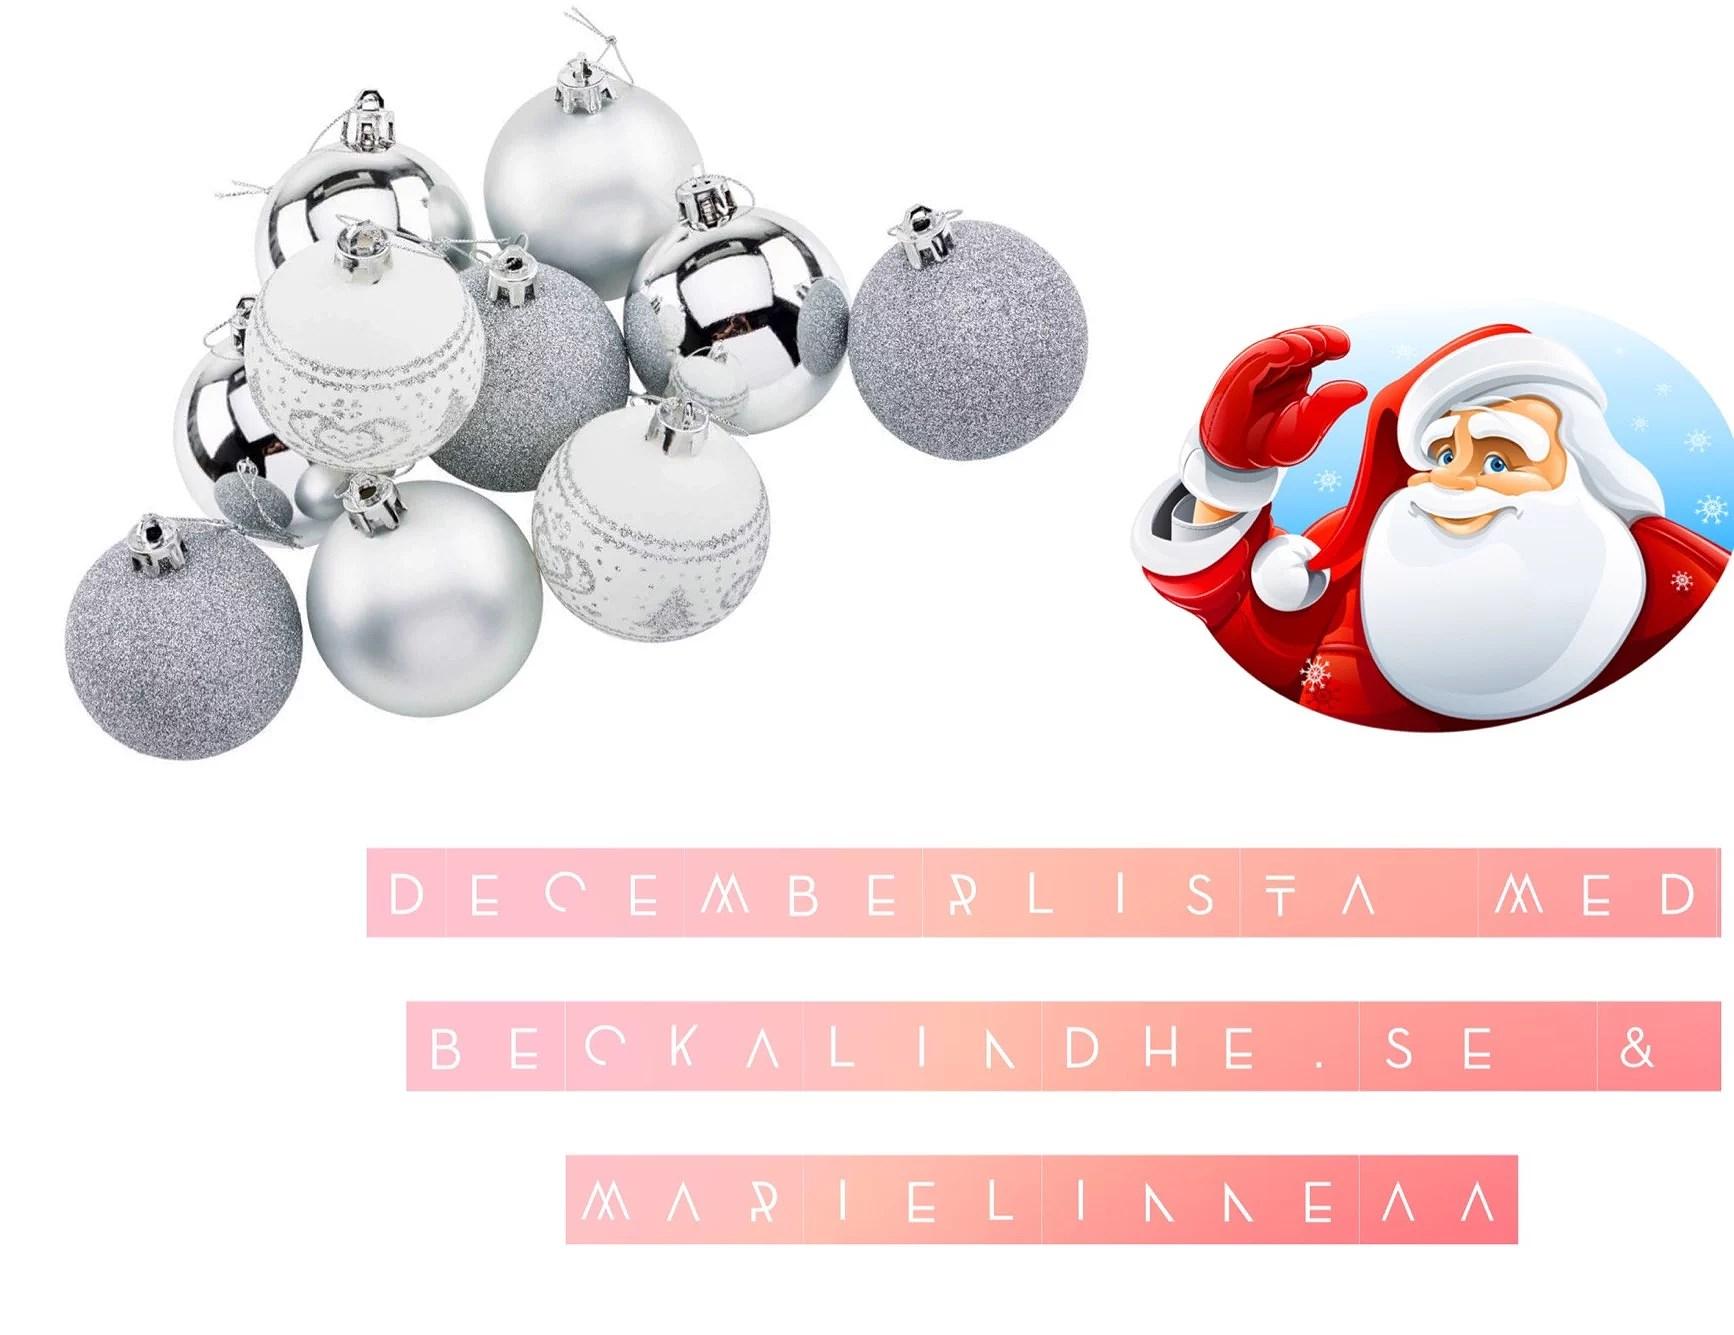 Decemberlista dag 11